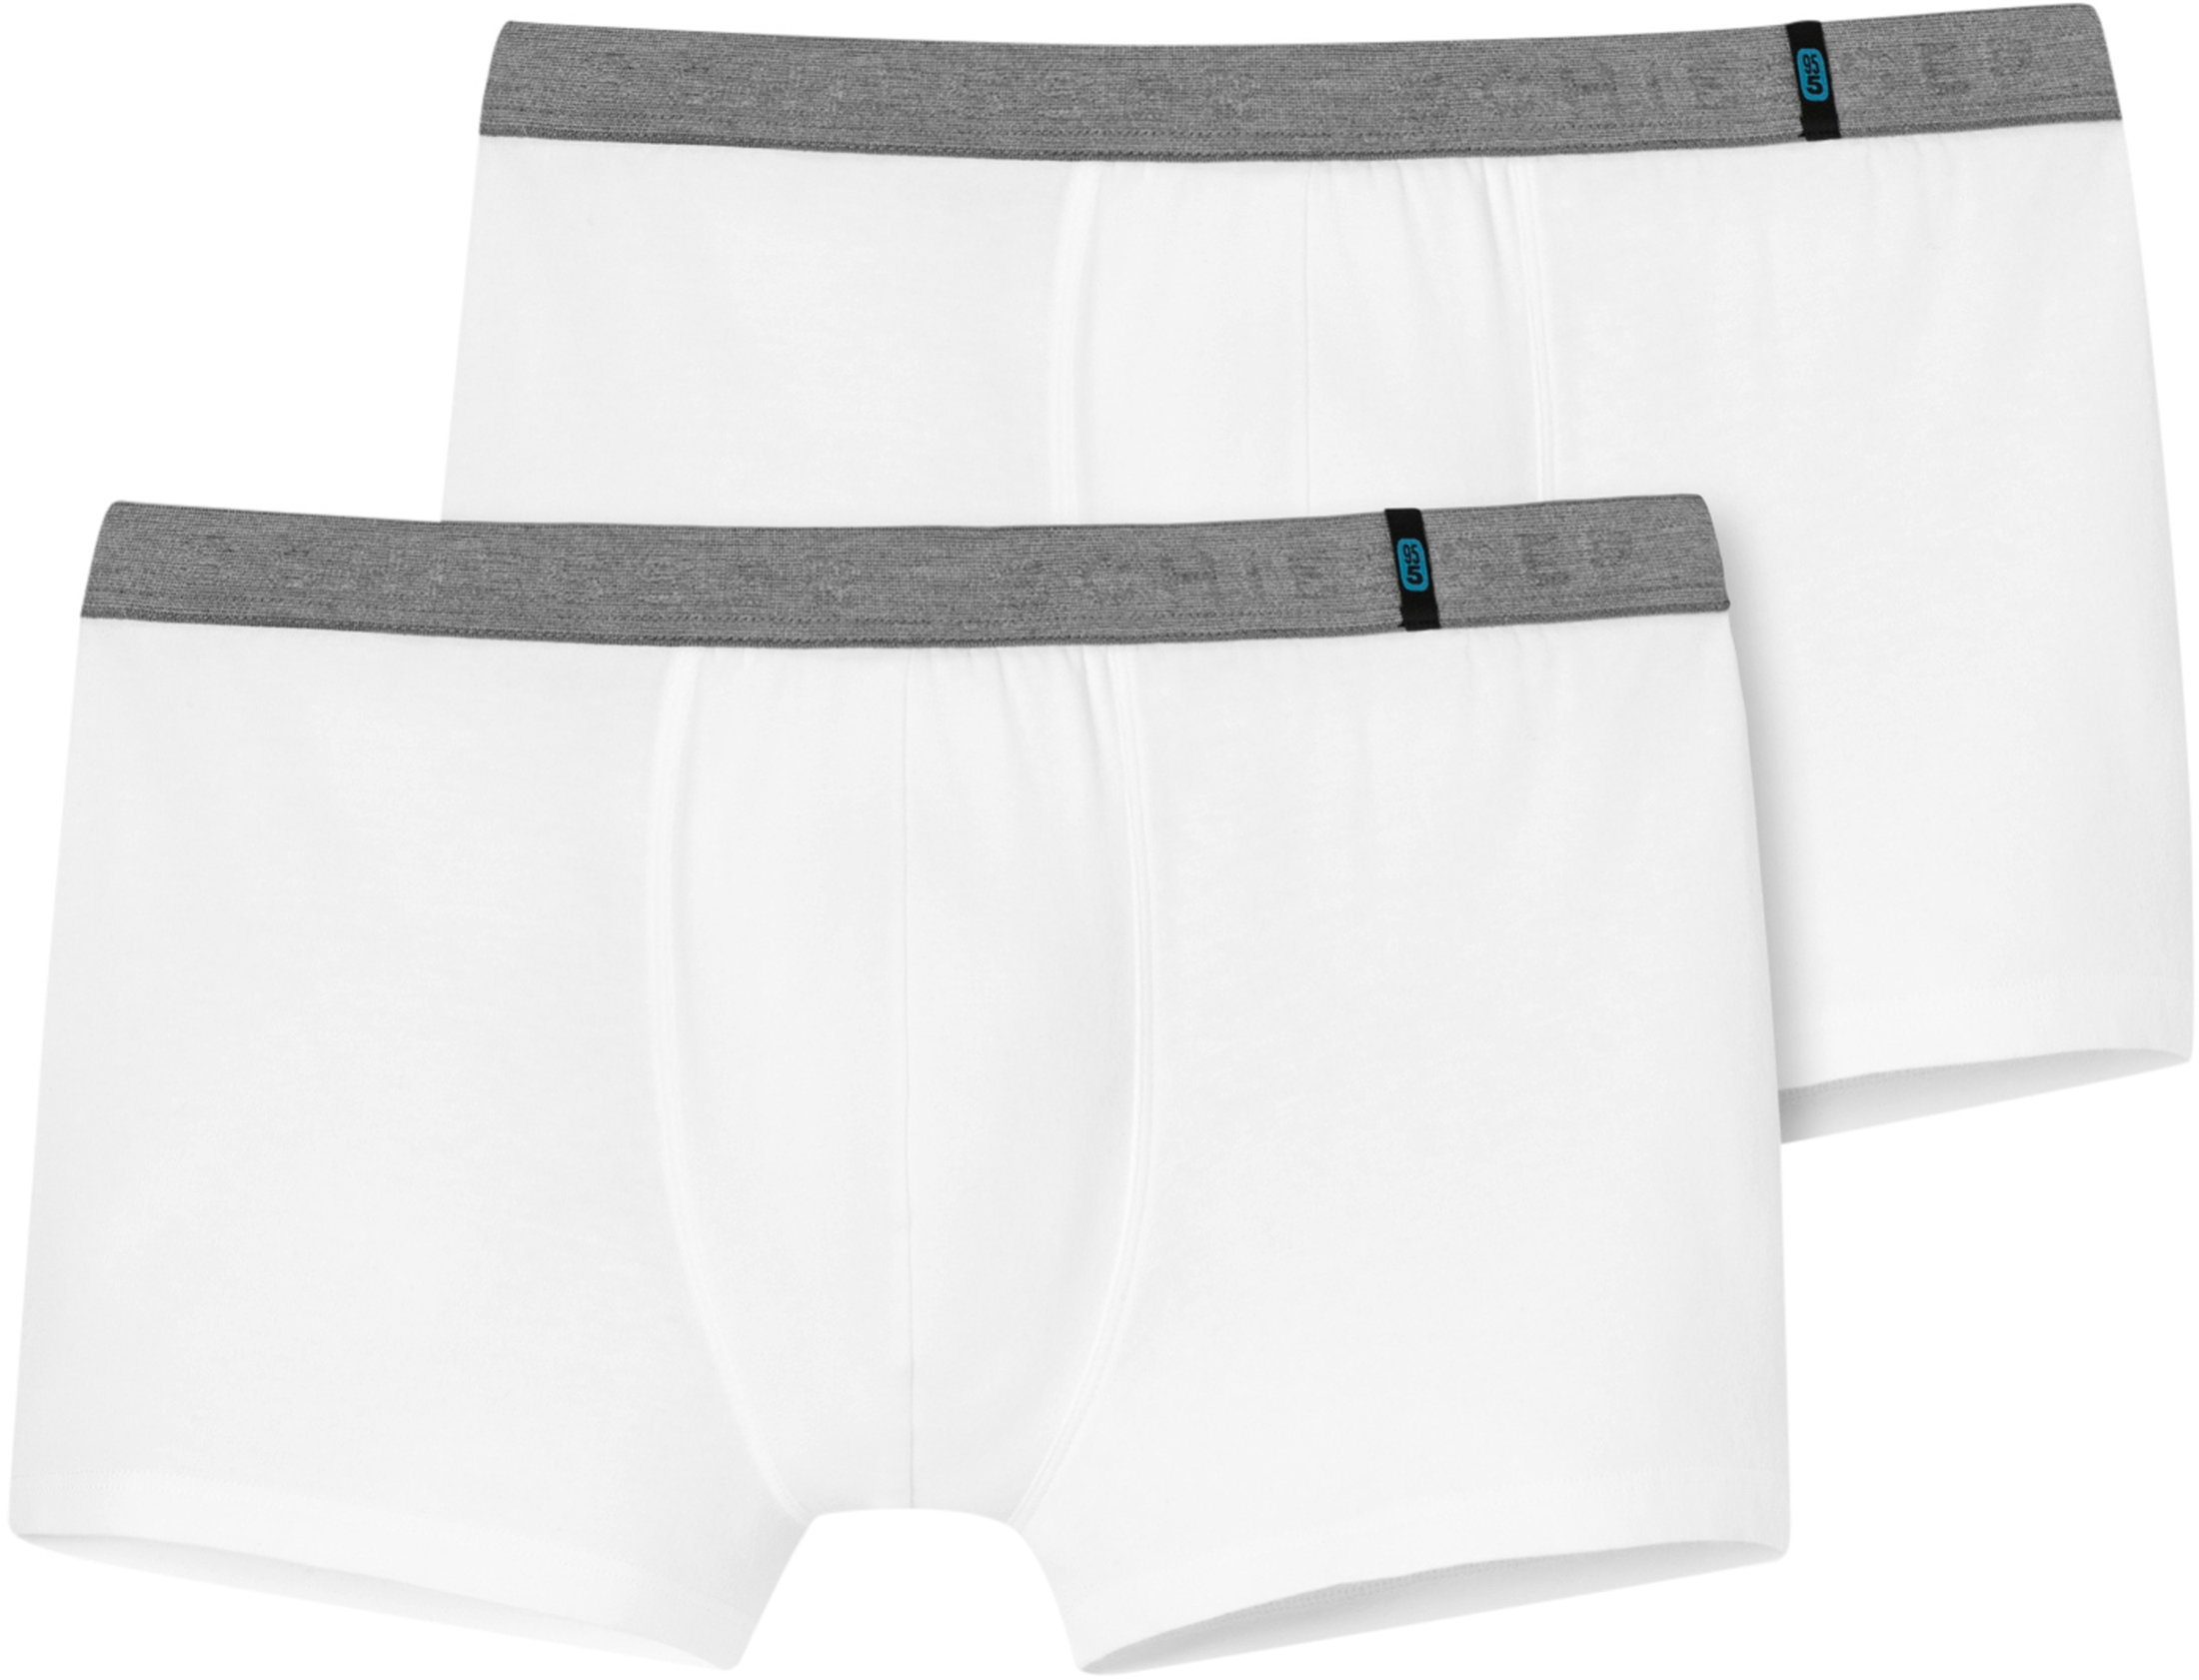 Schiesser Boxer Shorts White Grey 2-Pack